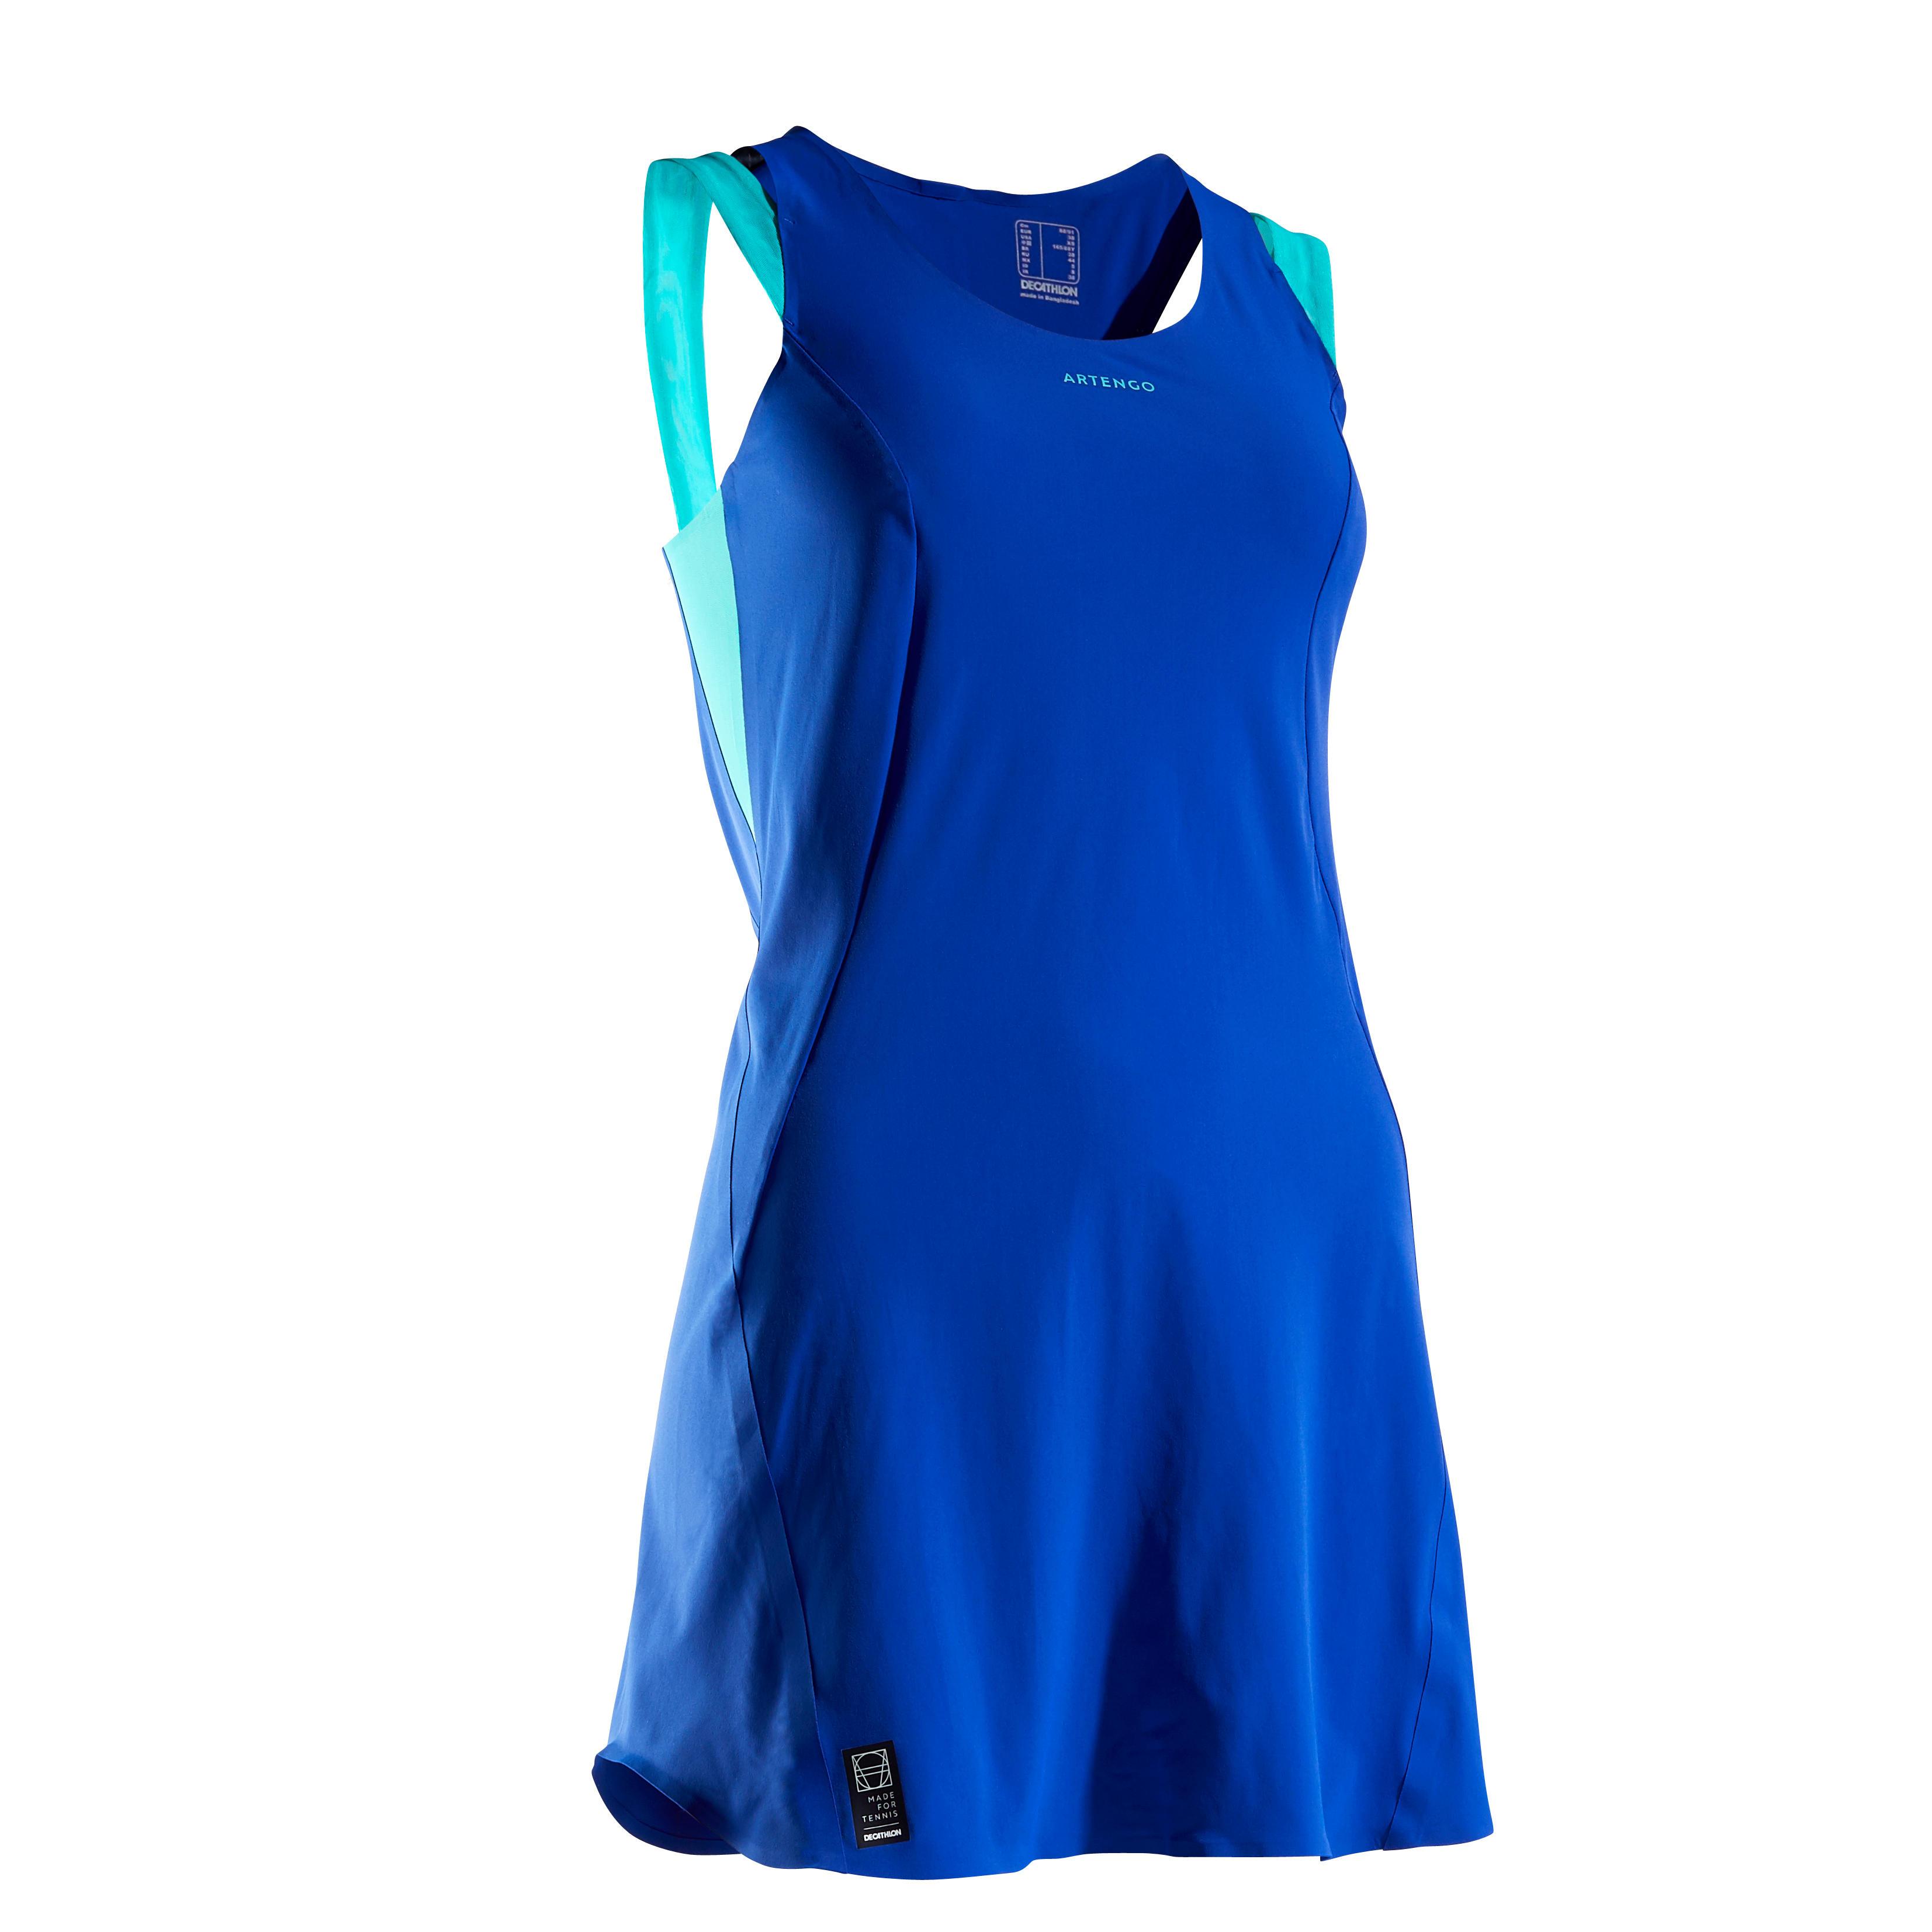 Tenniskleid DR Light 990 blau | Sportbekleidung > Sportröcke | Artengo